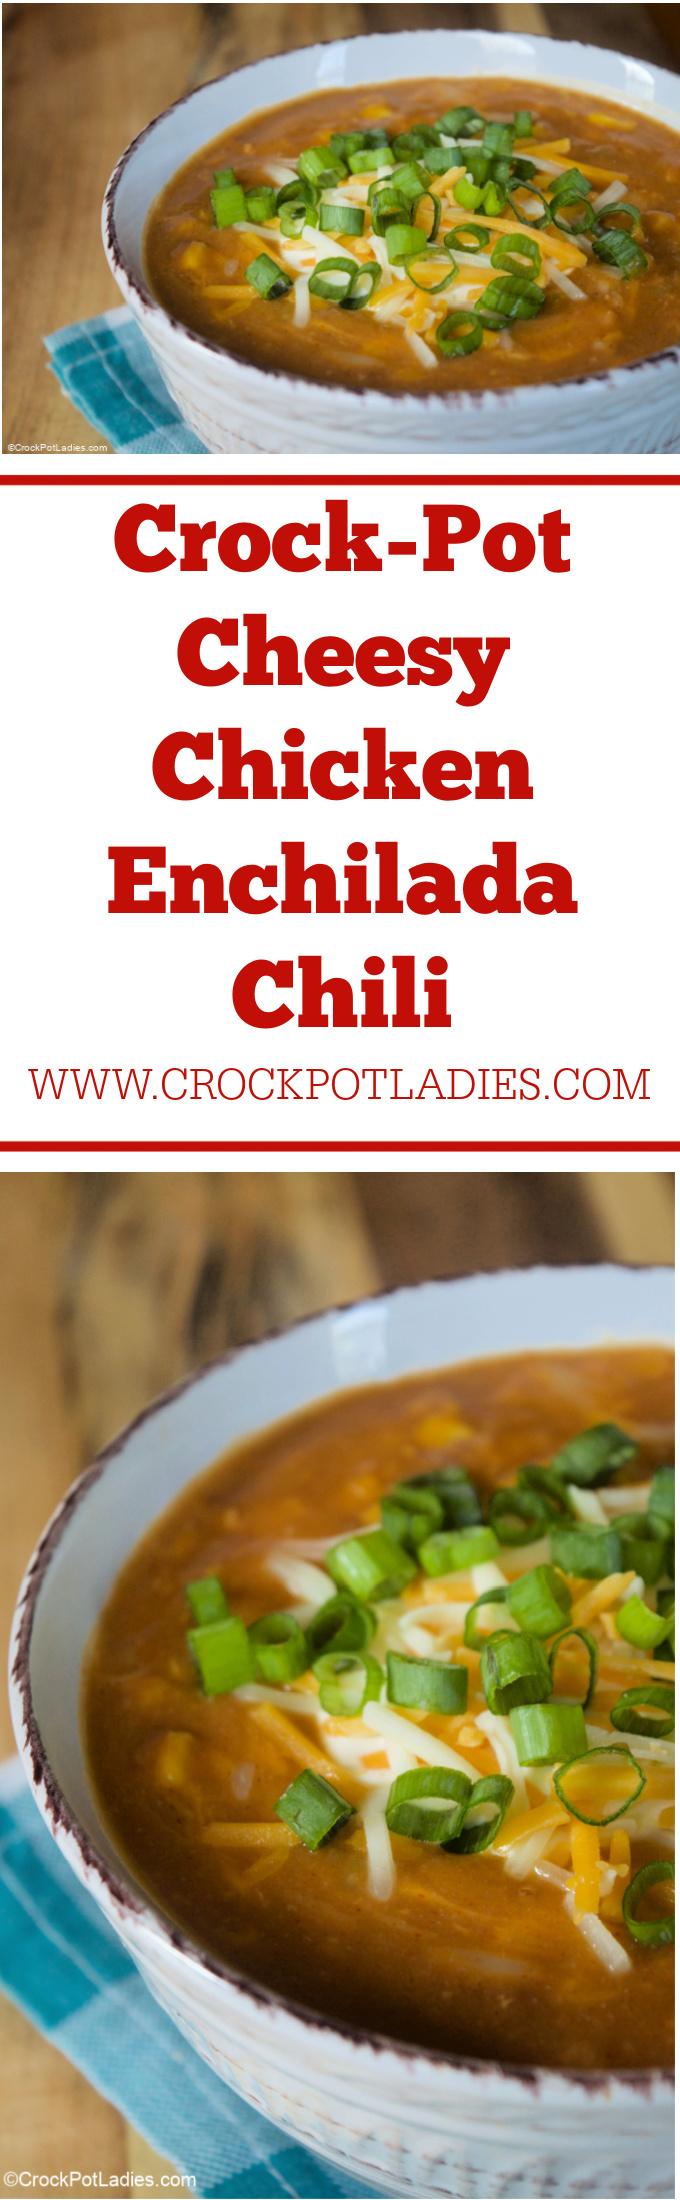 Crock-Pot Cheesy Chicken Enchilada Chili